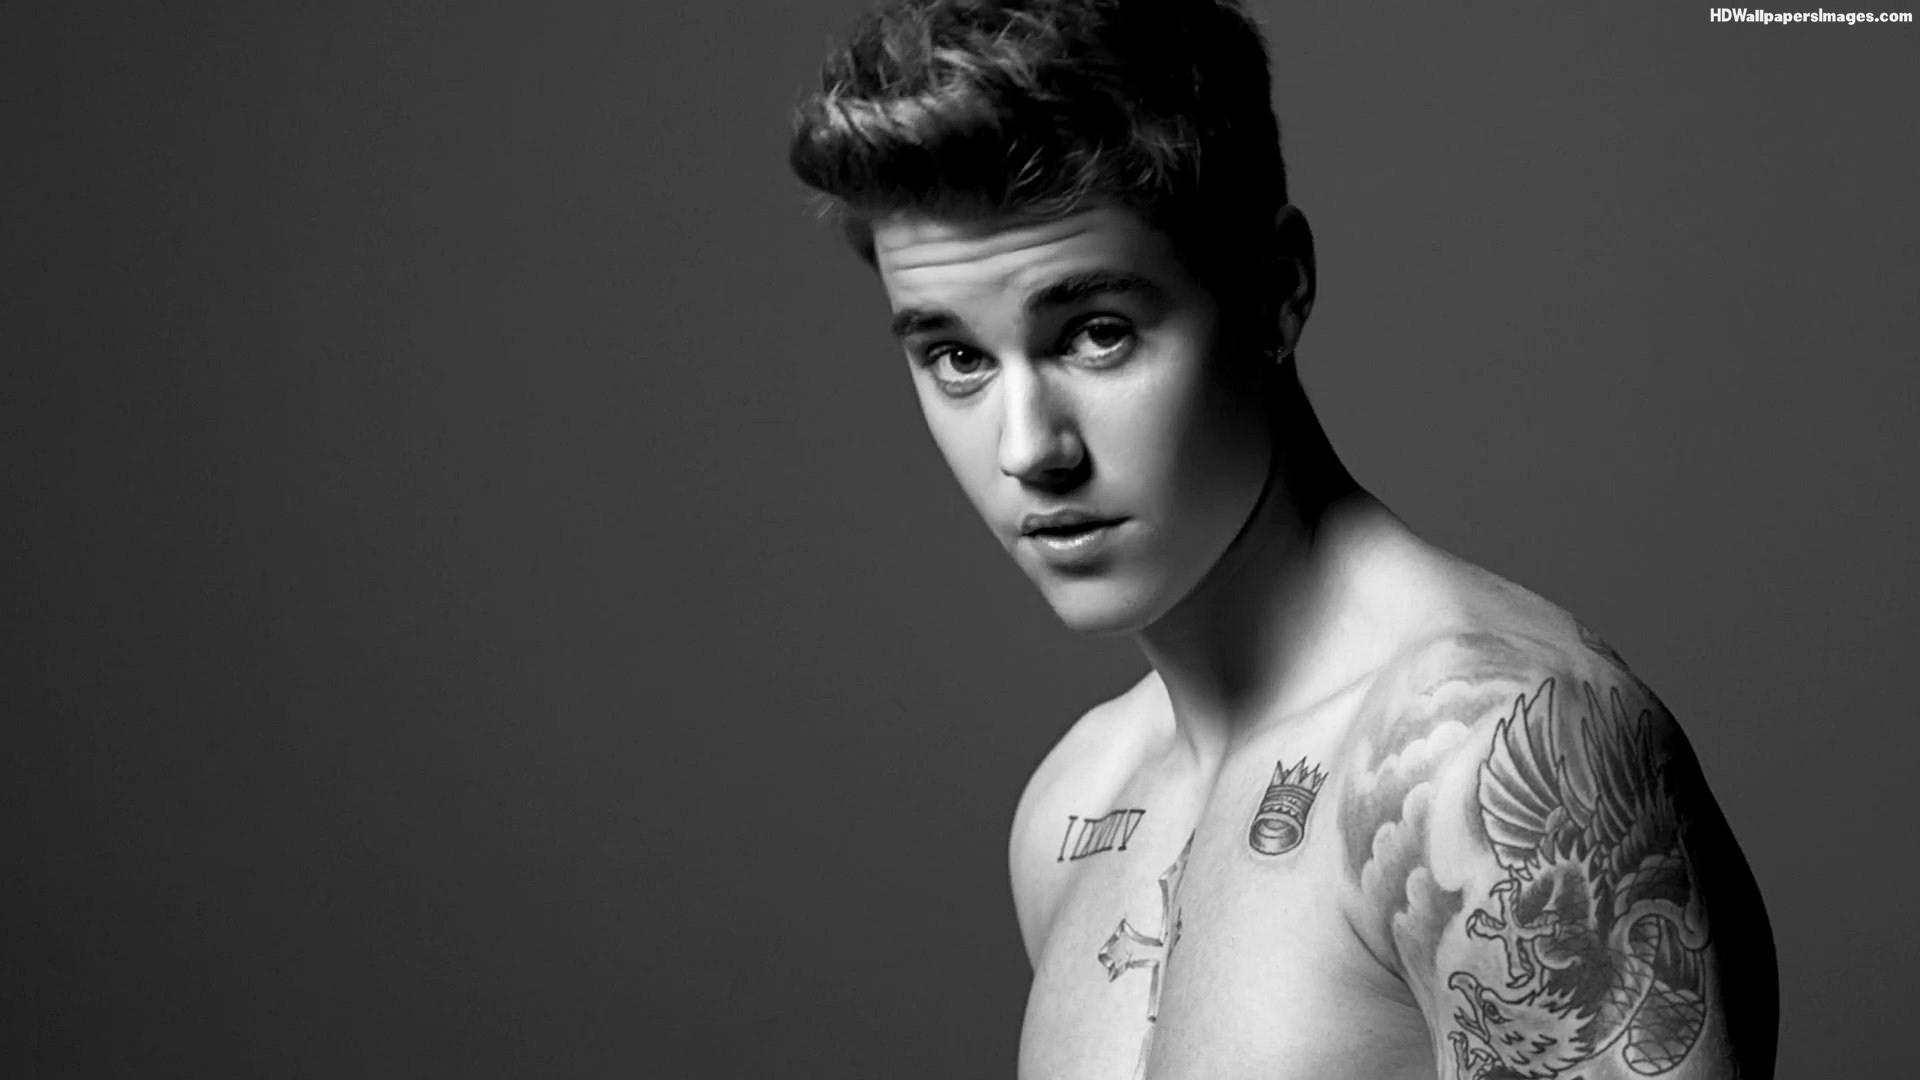 Justin Bieber Desktop Wallpaper 66 Pictures